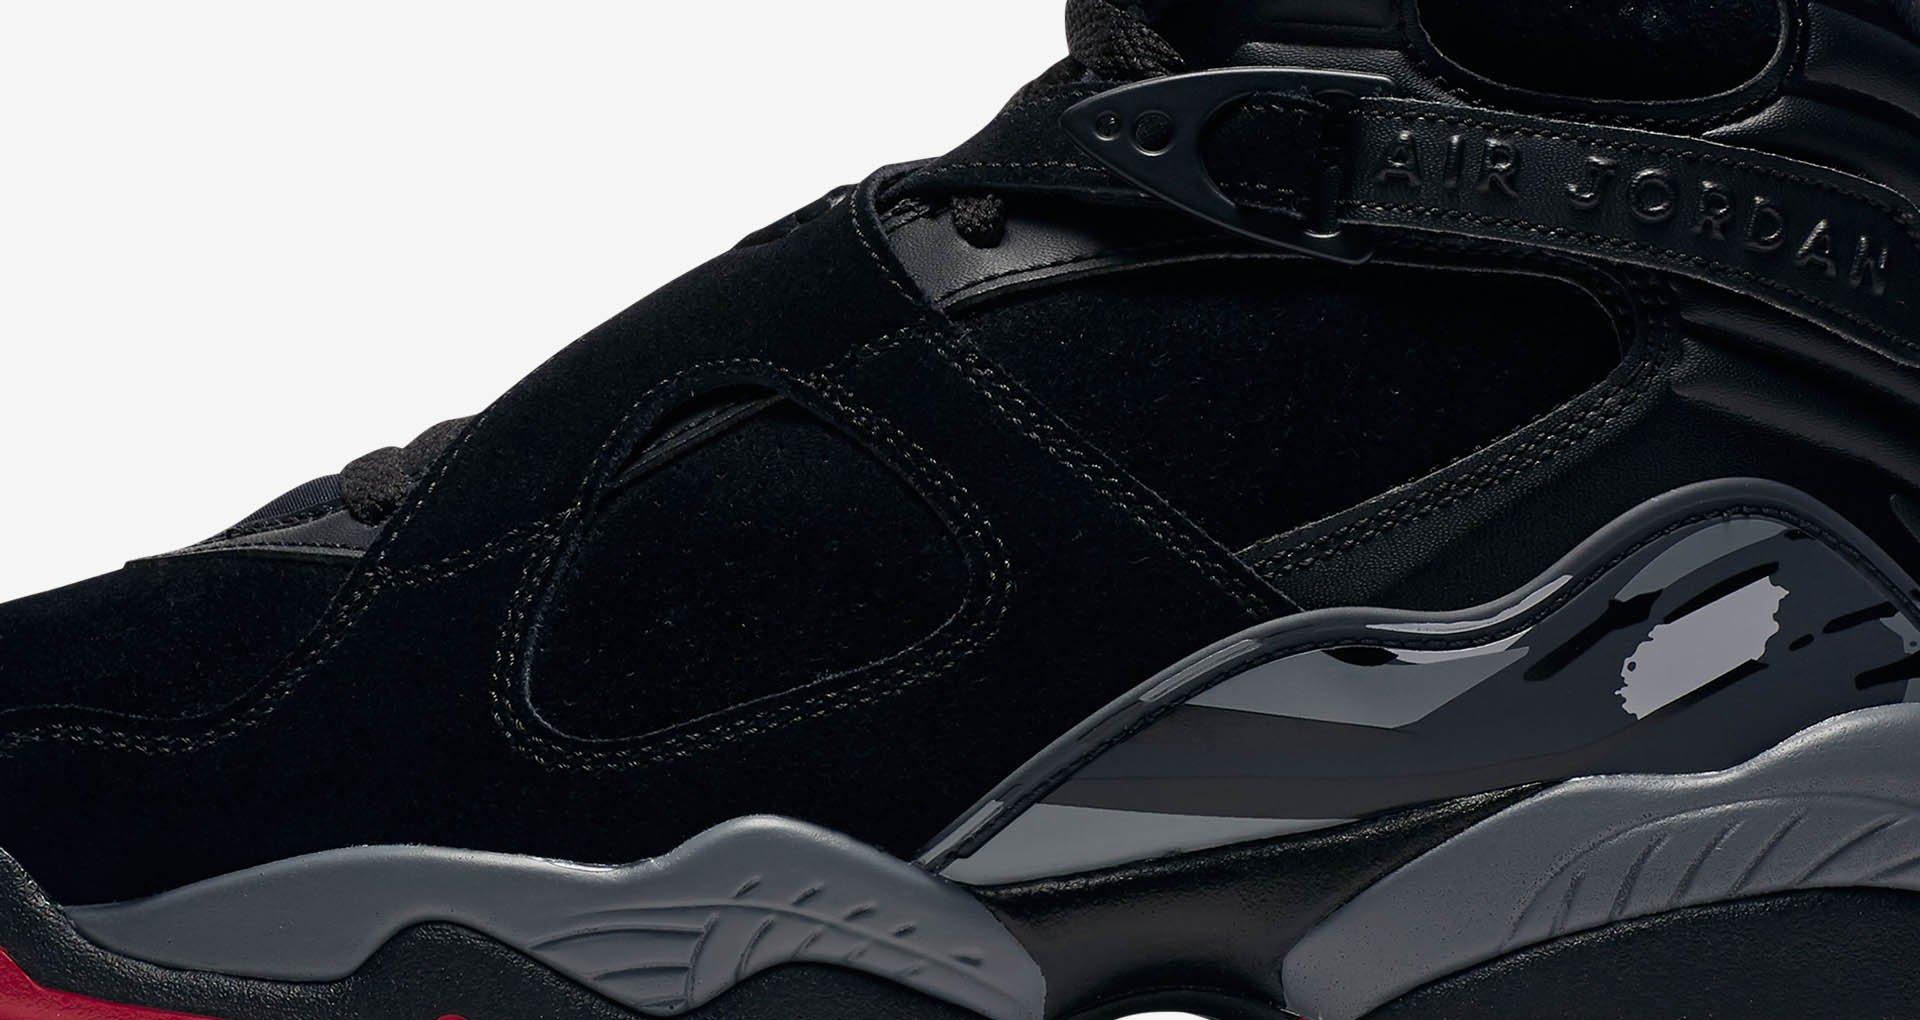 size 40 5f8f8 301bd Jordan 8 Bred Sneaker Tees Shirts to Match - Sneaker Match ...